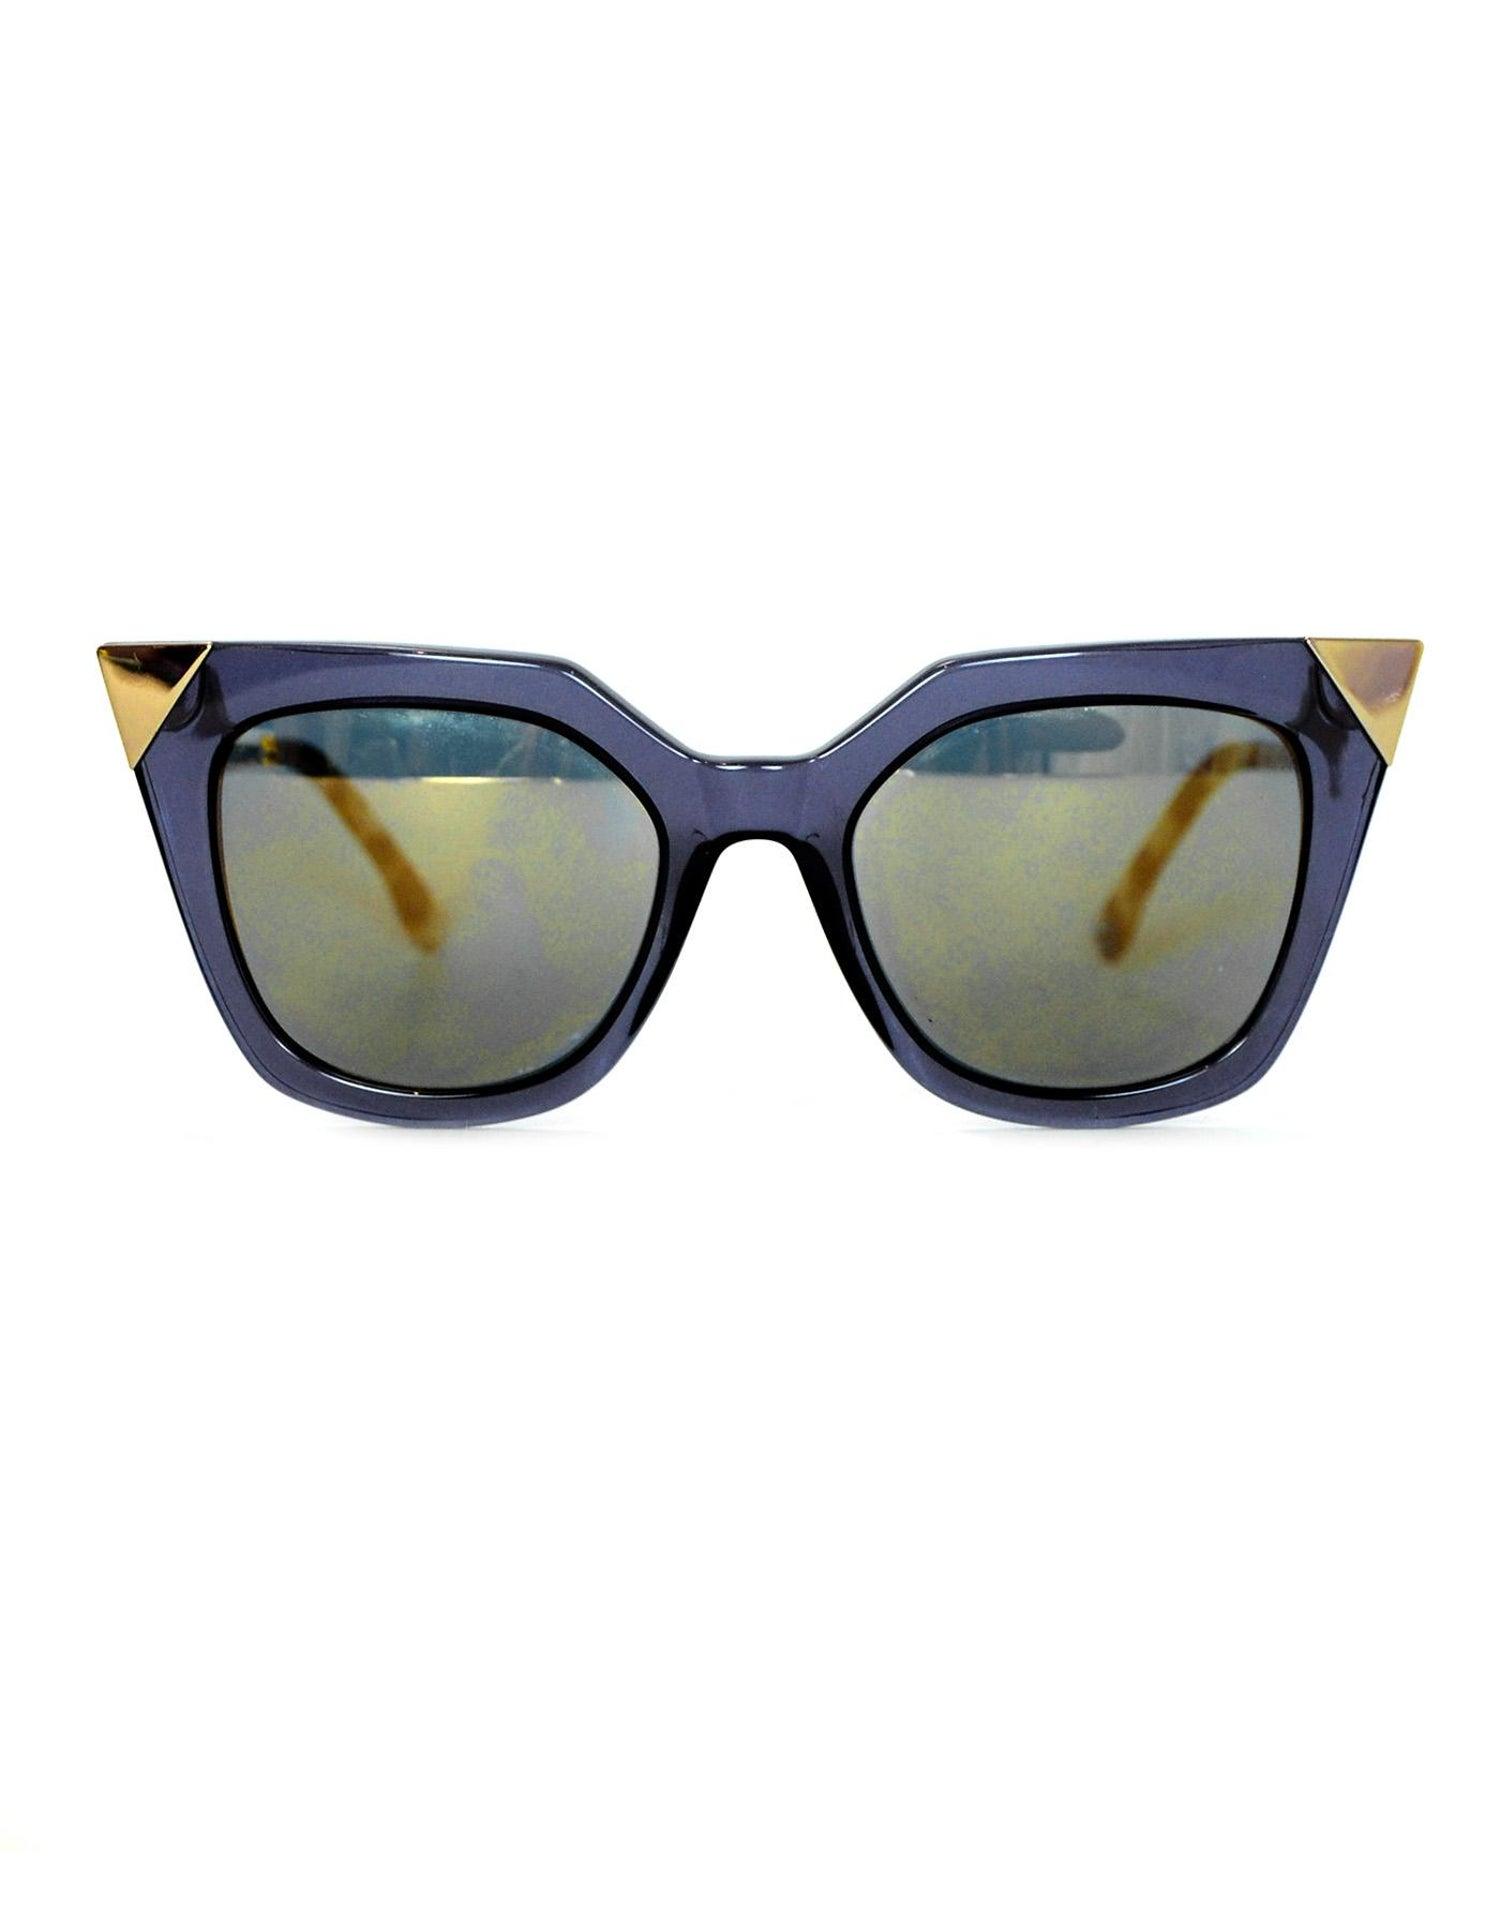 3eac5c09106 Fendi Blue Iridia Metal Tip Cat Eye Sunglasses w  Mirrored Lenses rt.  465 For  Sale at 1stdibs